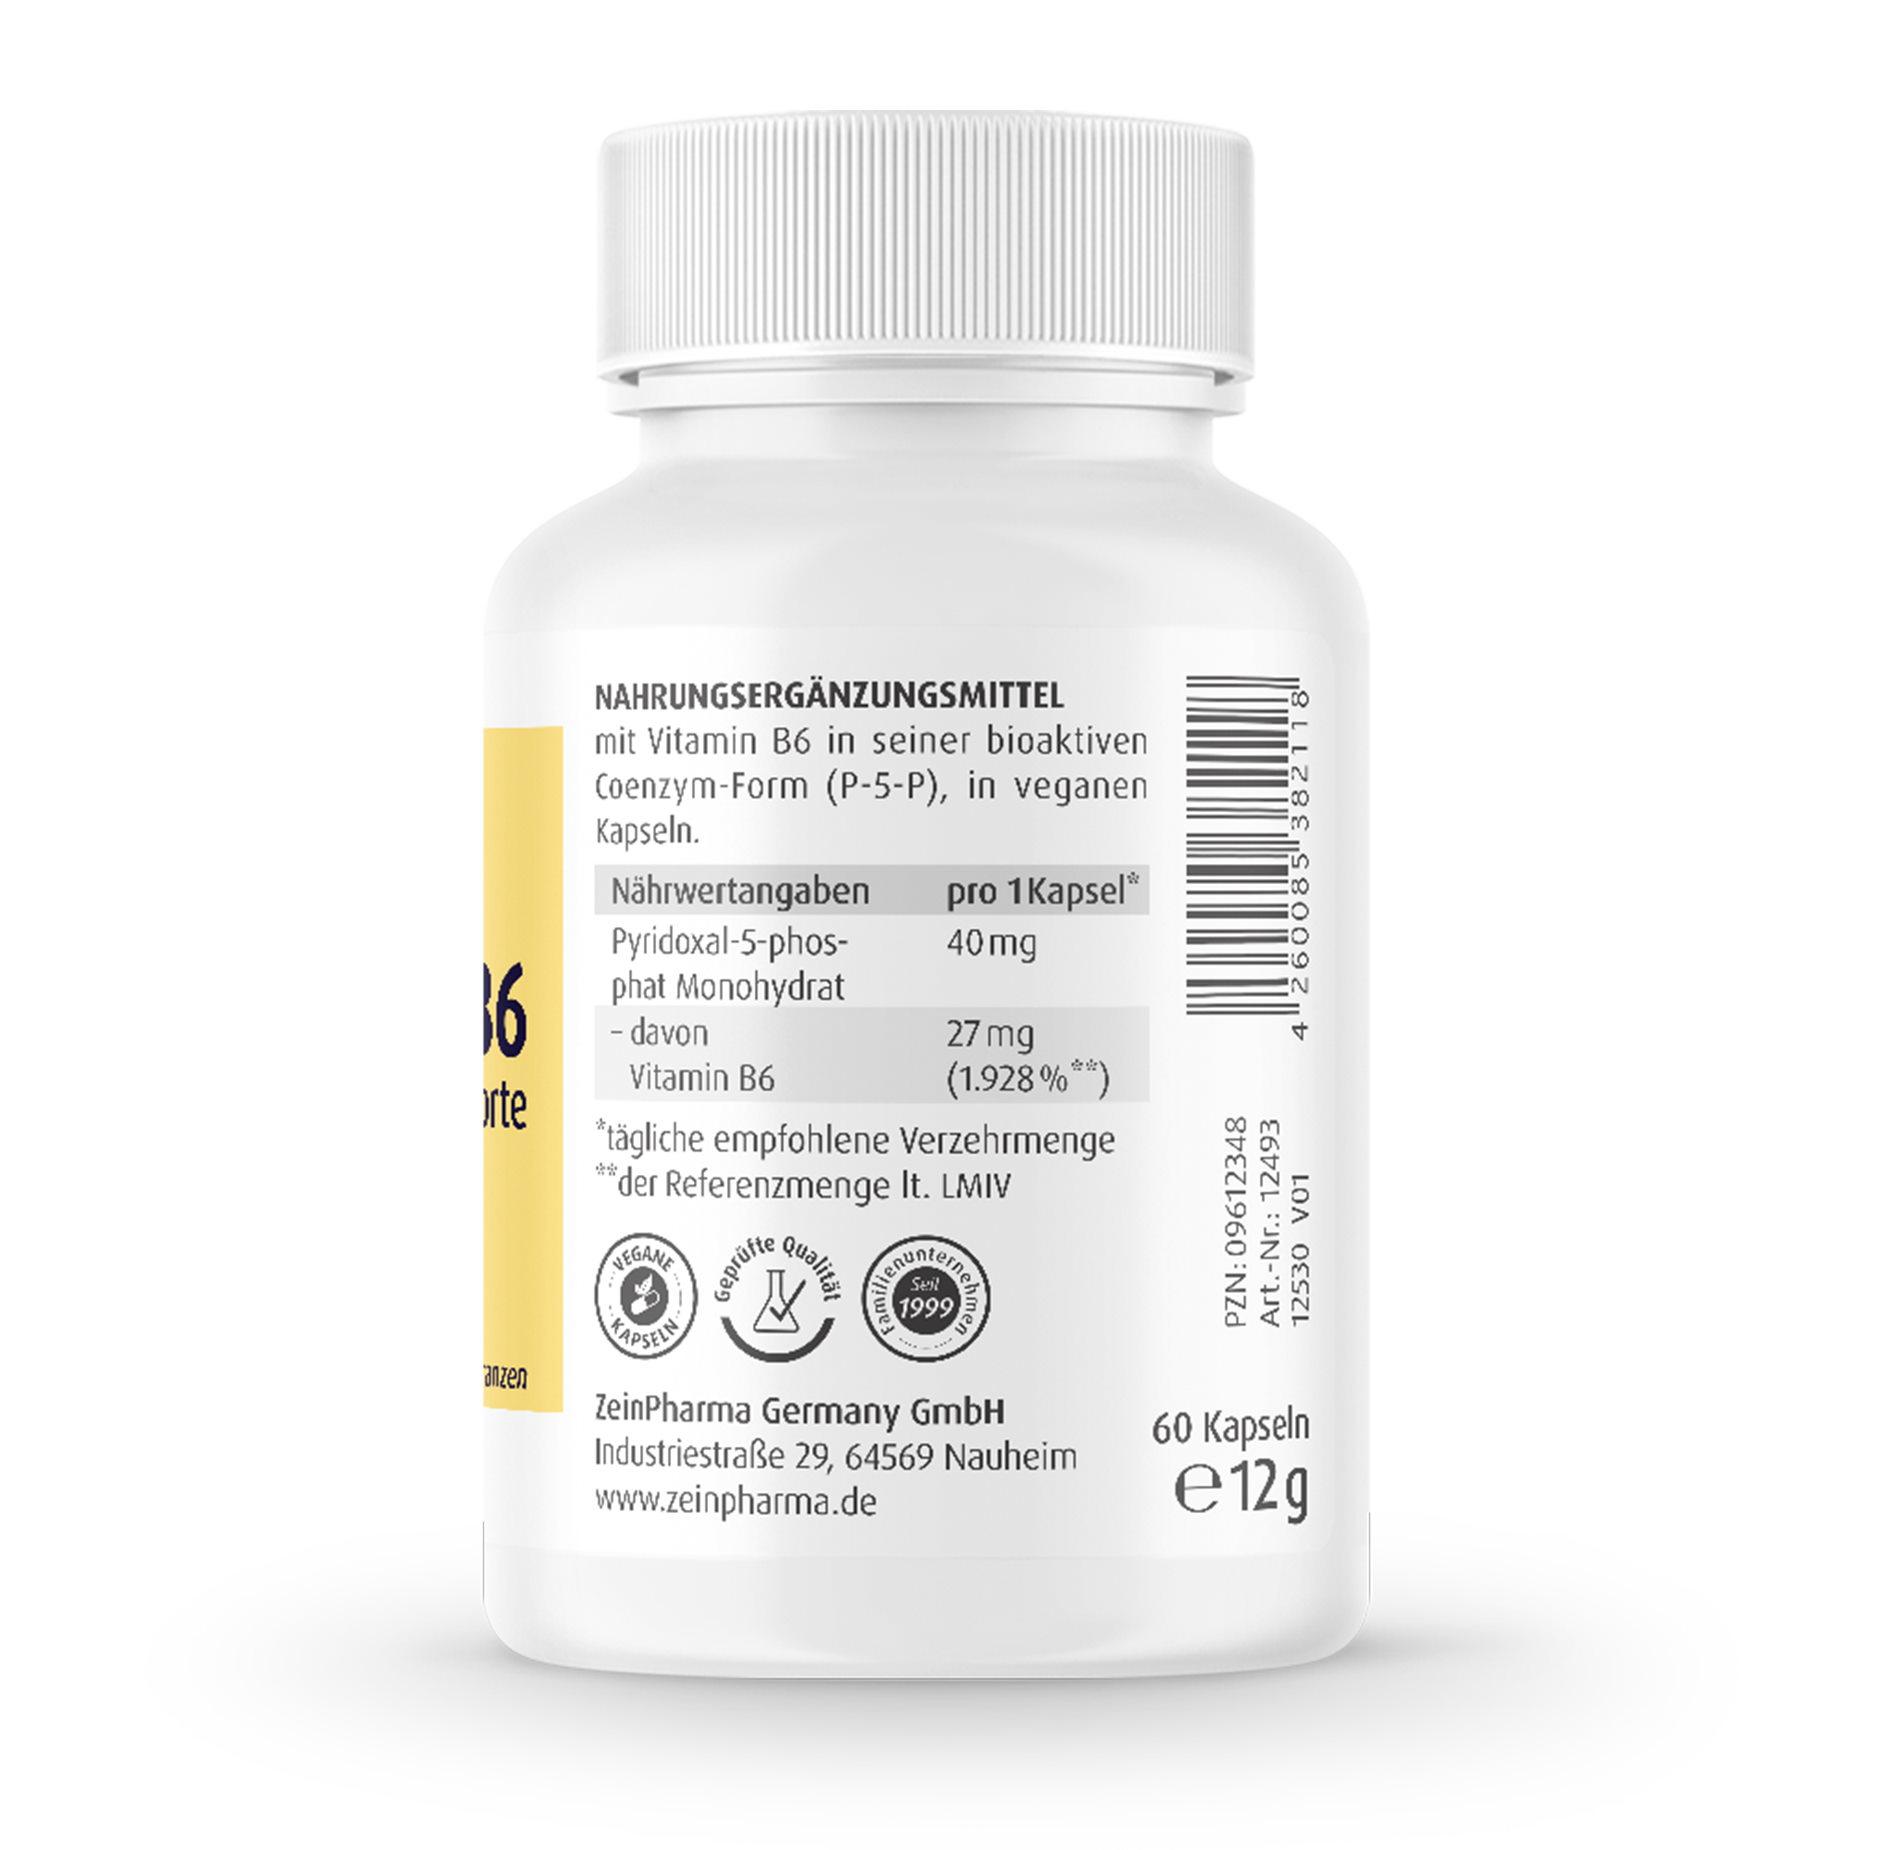 P-5-P 60 Kapseln (Vitamin B6) 40mg